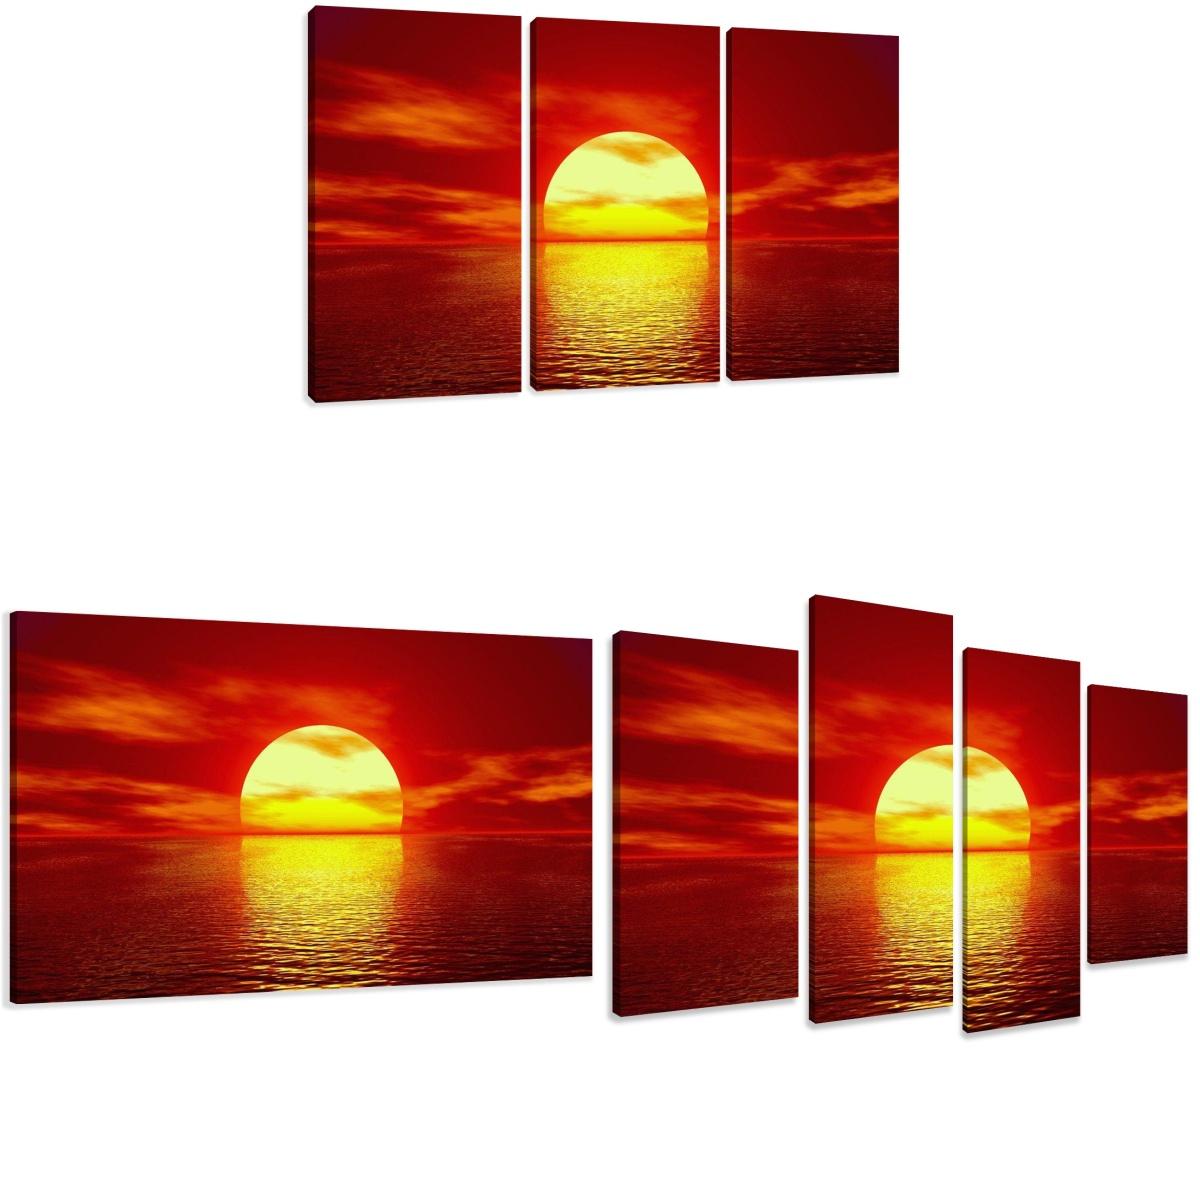 leinwand wandbilder bild sonnenuntergang verschiedene. Black Bedroom Furniture Sets. Home Design Ideas